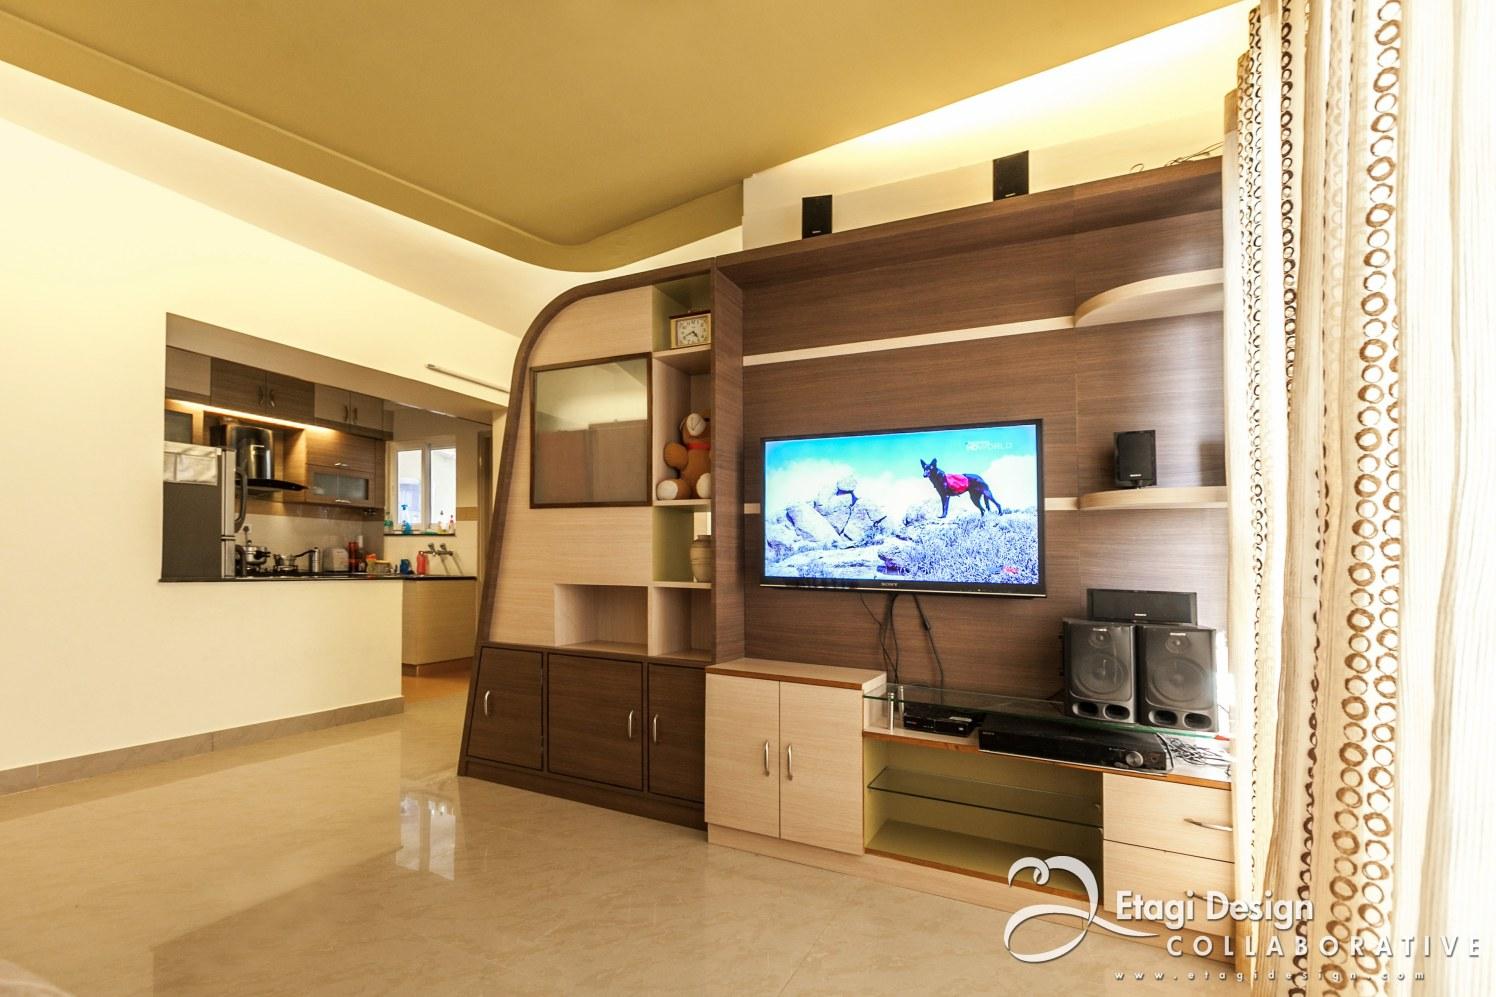 Living Room With Wooden TV Unit by Prashanth Nandiprasad Living-room Modern   Interior Design Photos & Ideas